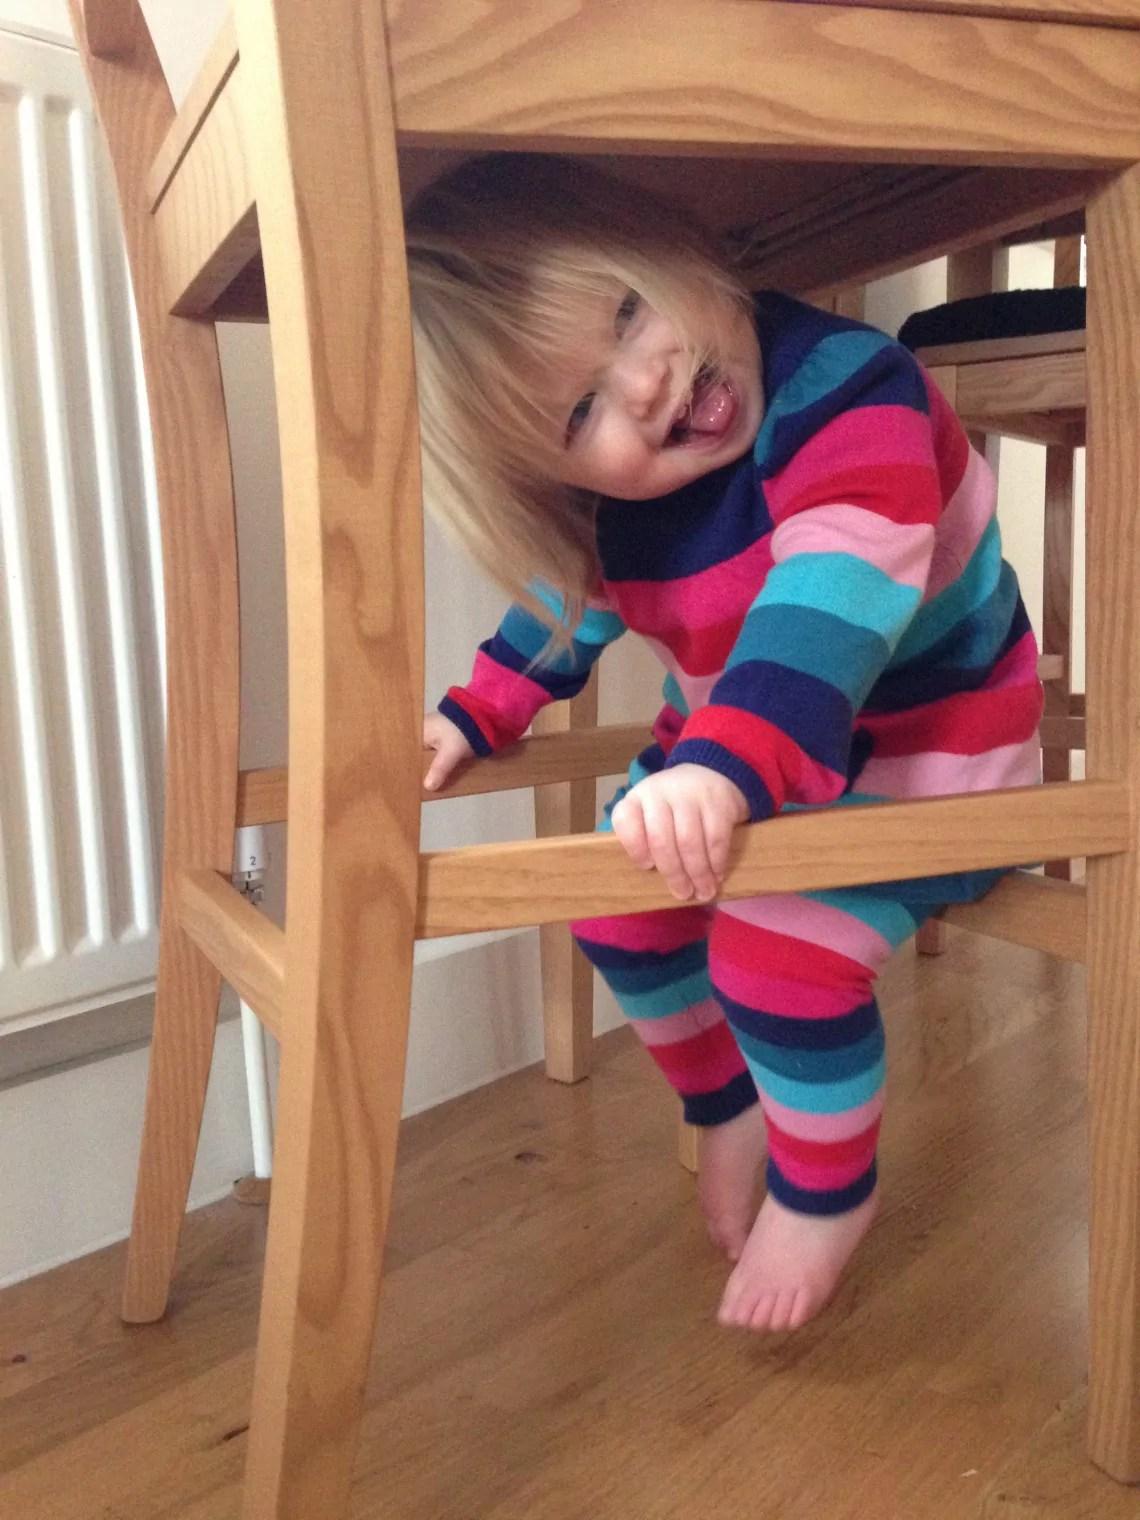 Spatial Awareness Activities To Help Your Child Explore